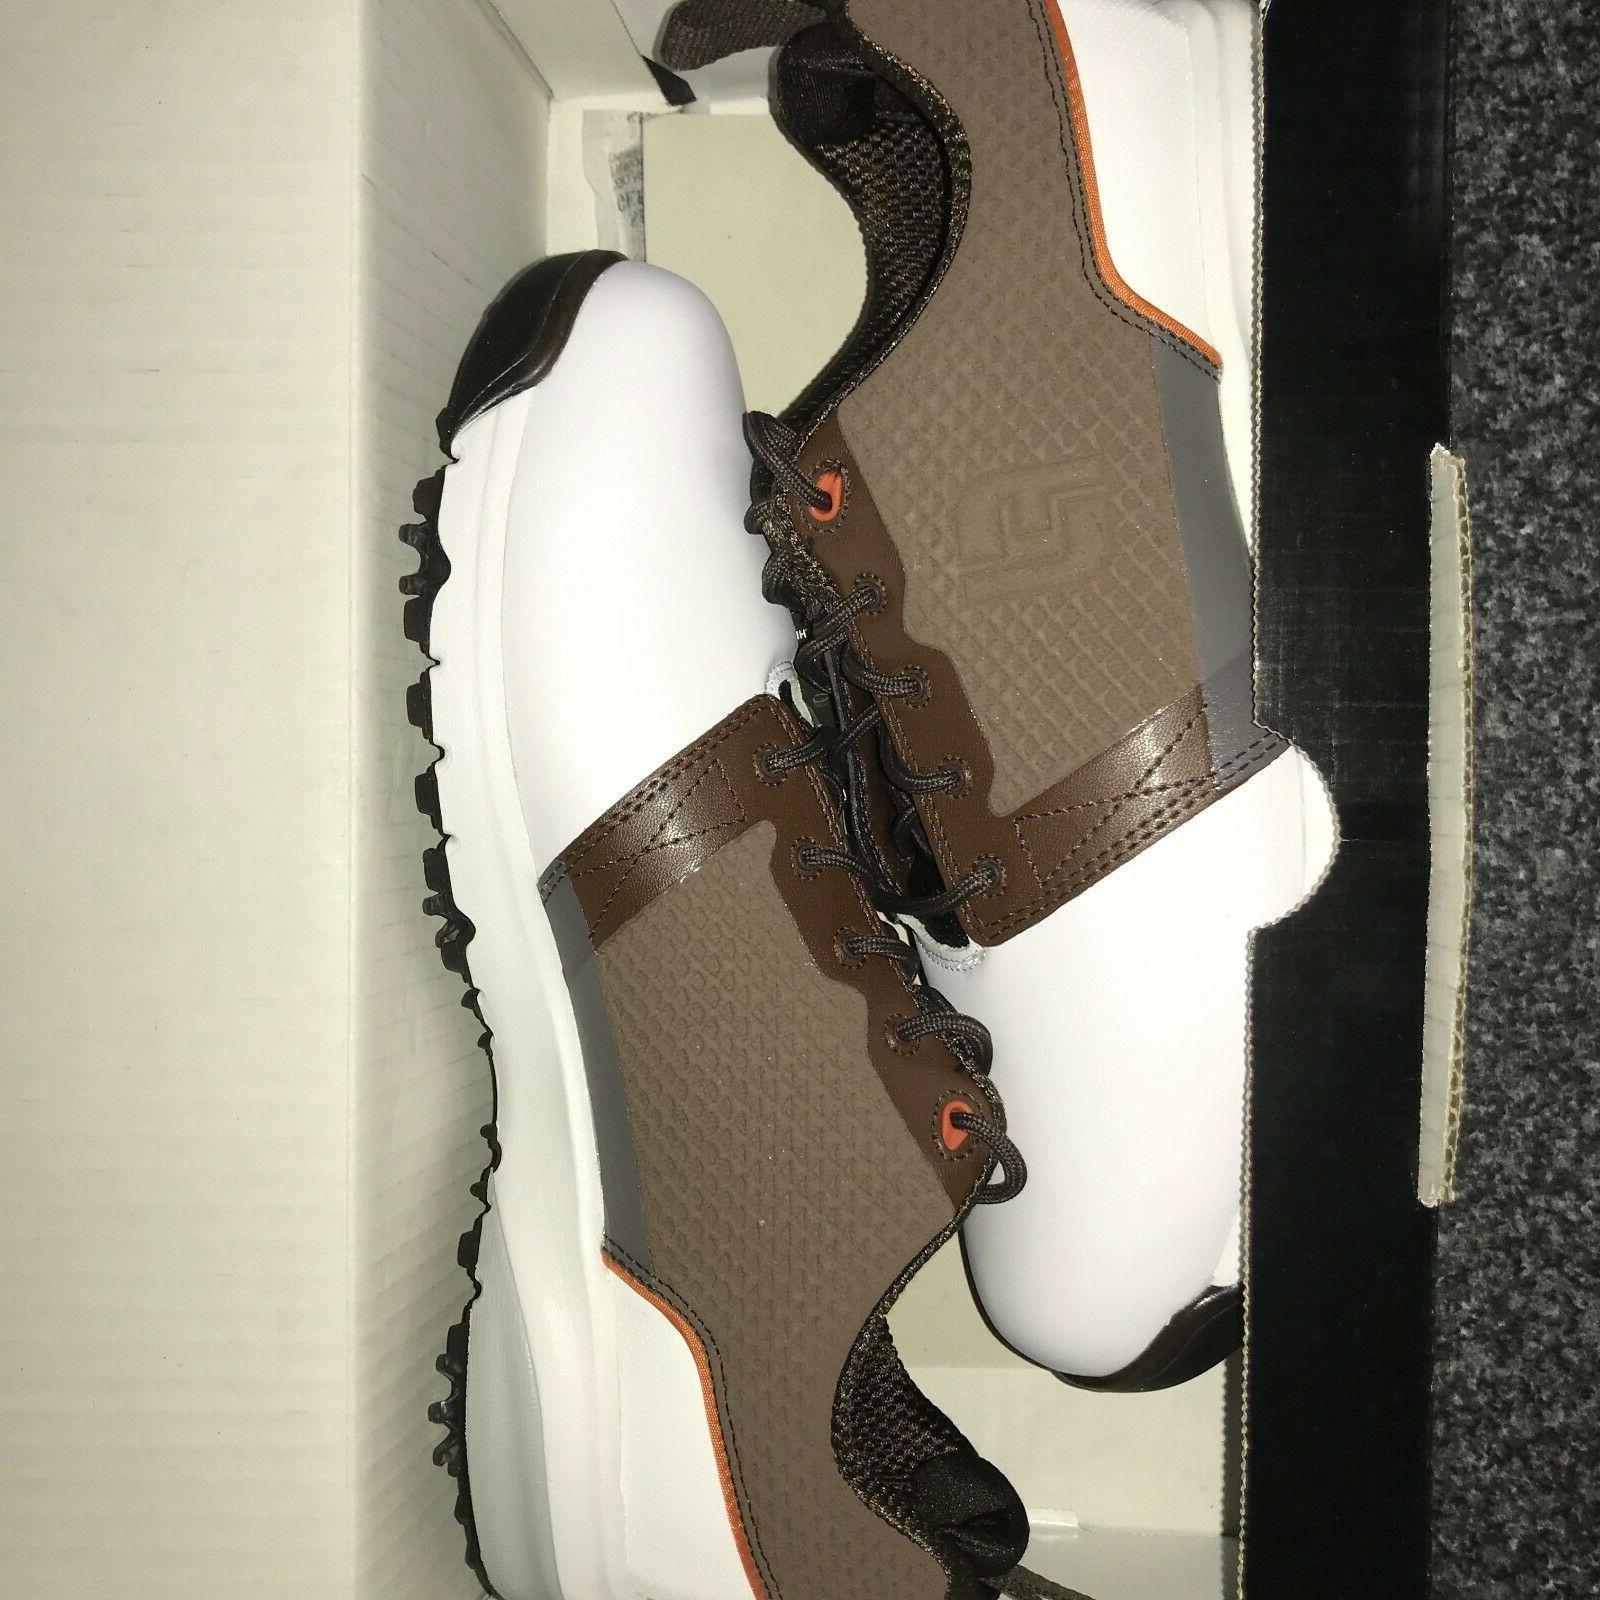 FootJoy Golf New White/Brown 8, 10.5, 11,